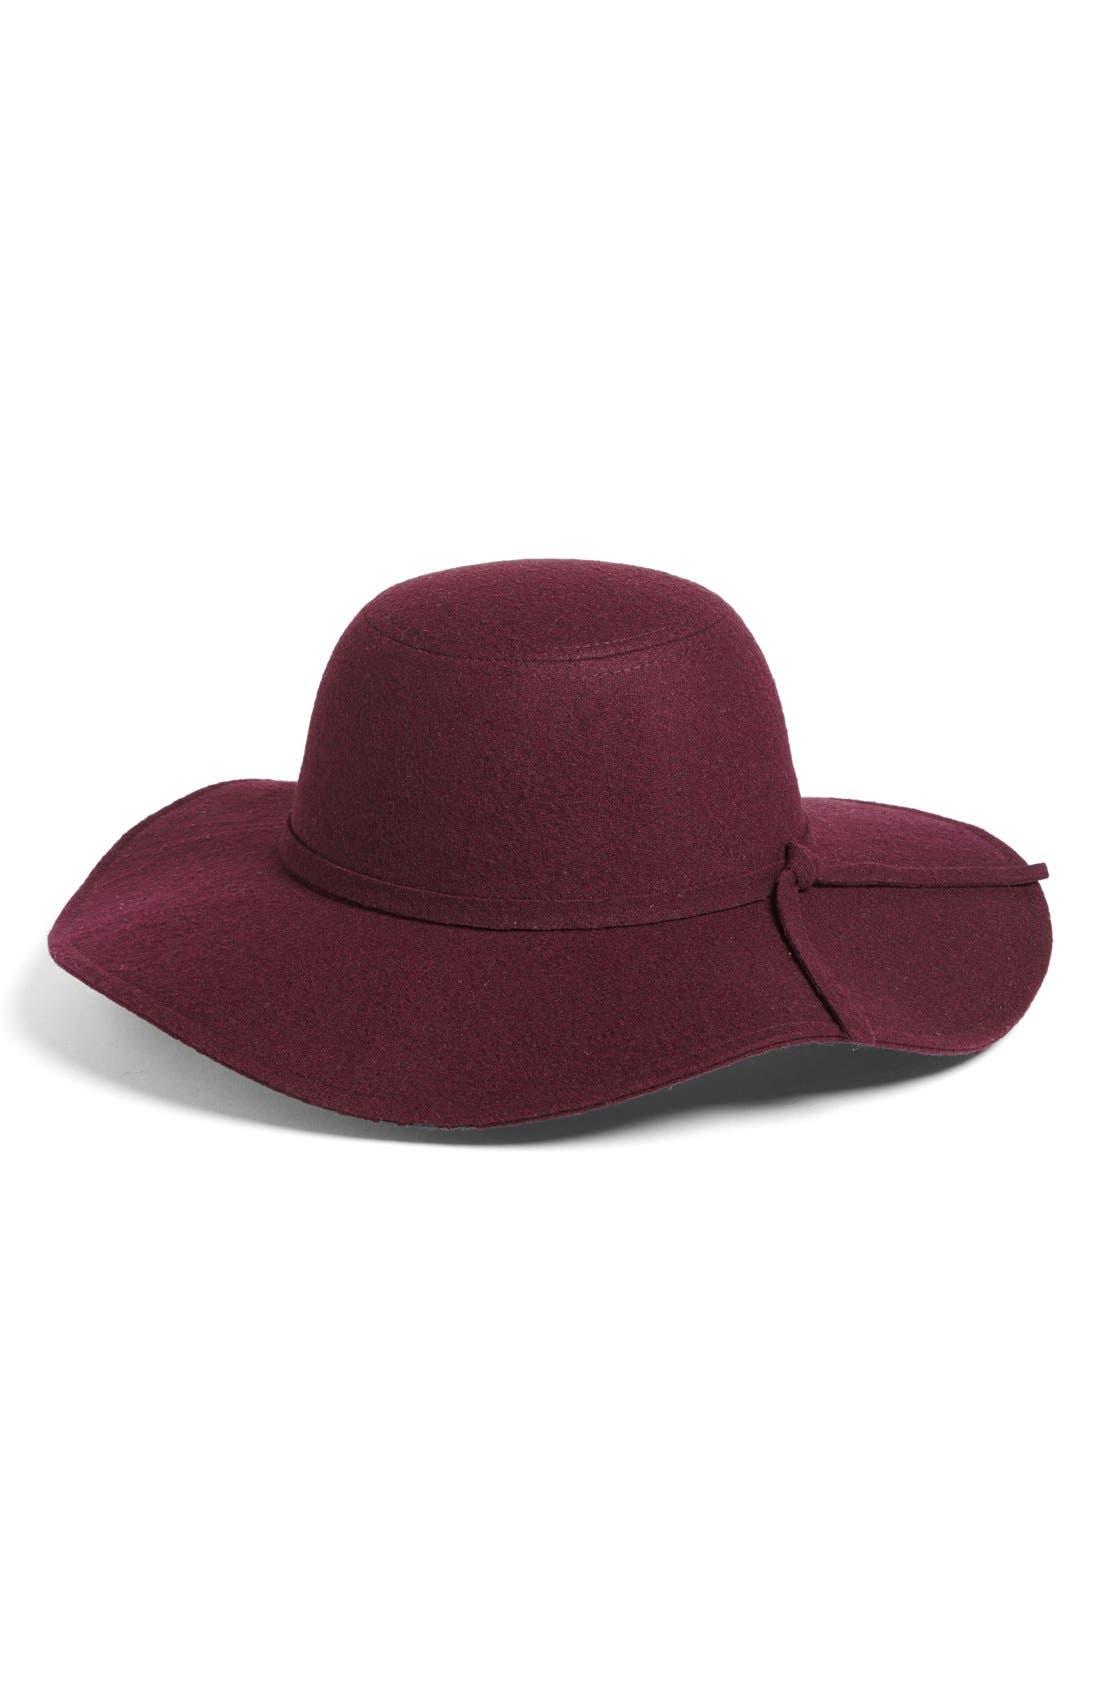 Main Image - Leith Floppy Felt Hat